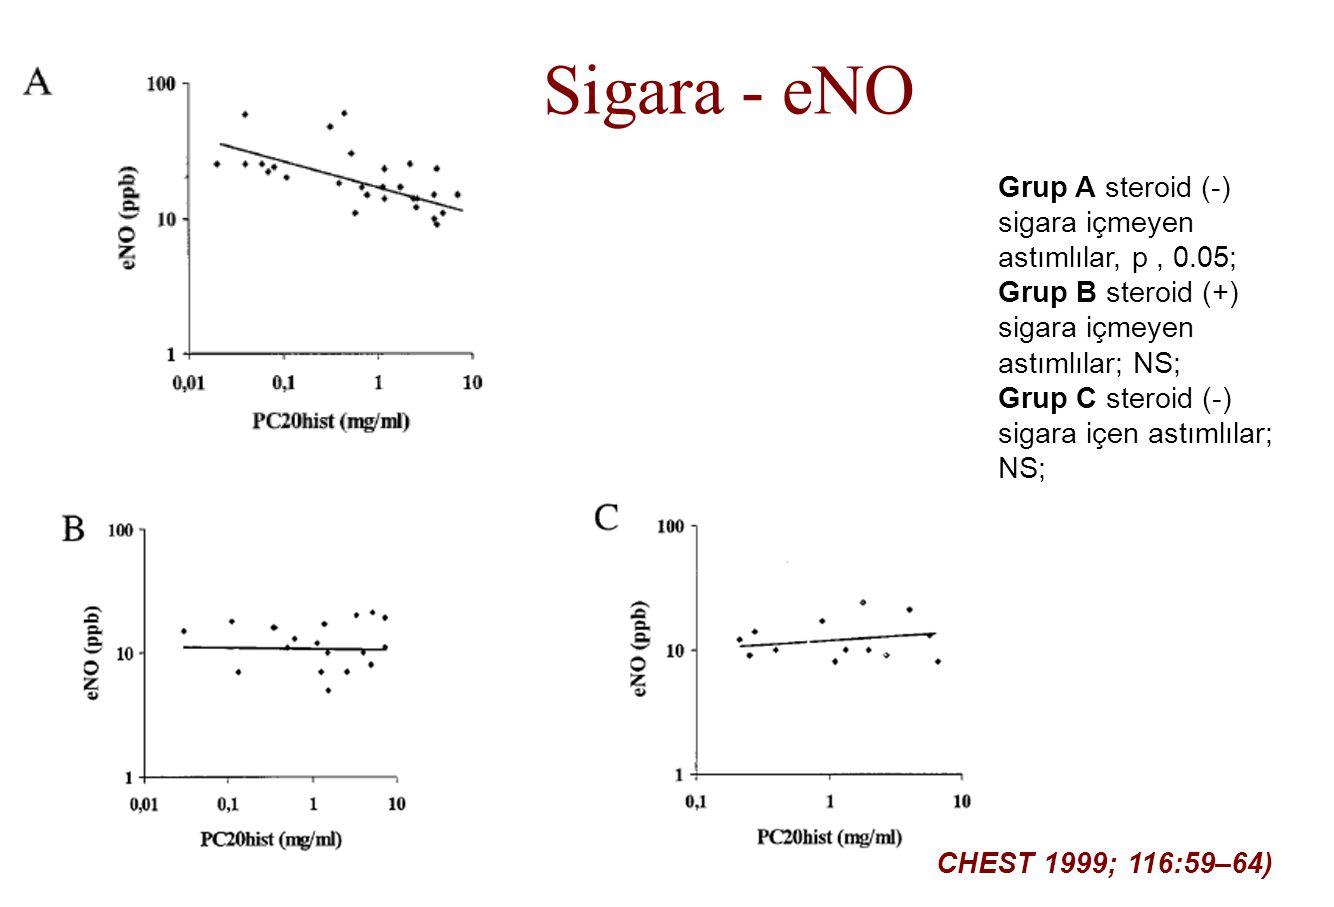 Grup A steroid (-) sigara içmeyen astımlılar, p, 0.05; Grup B steroid (+) sigara içmeyen astımlılar; NS; Grup C steroid (-) sigara içen astımlılar; NS